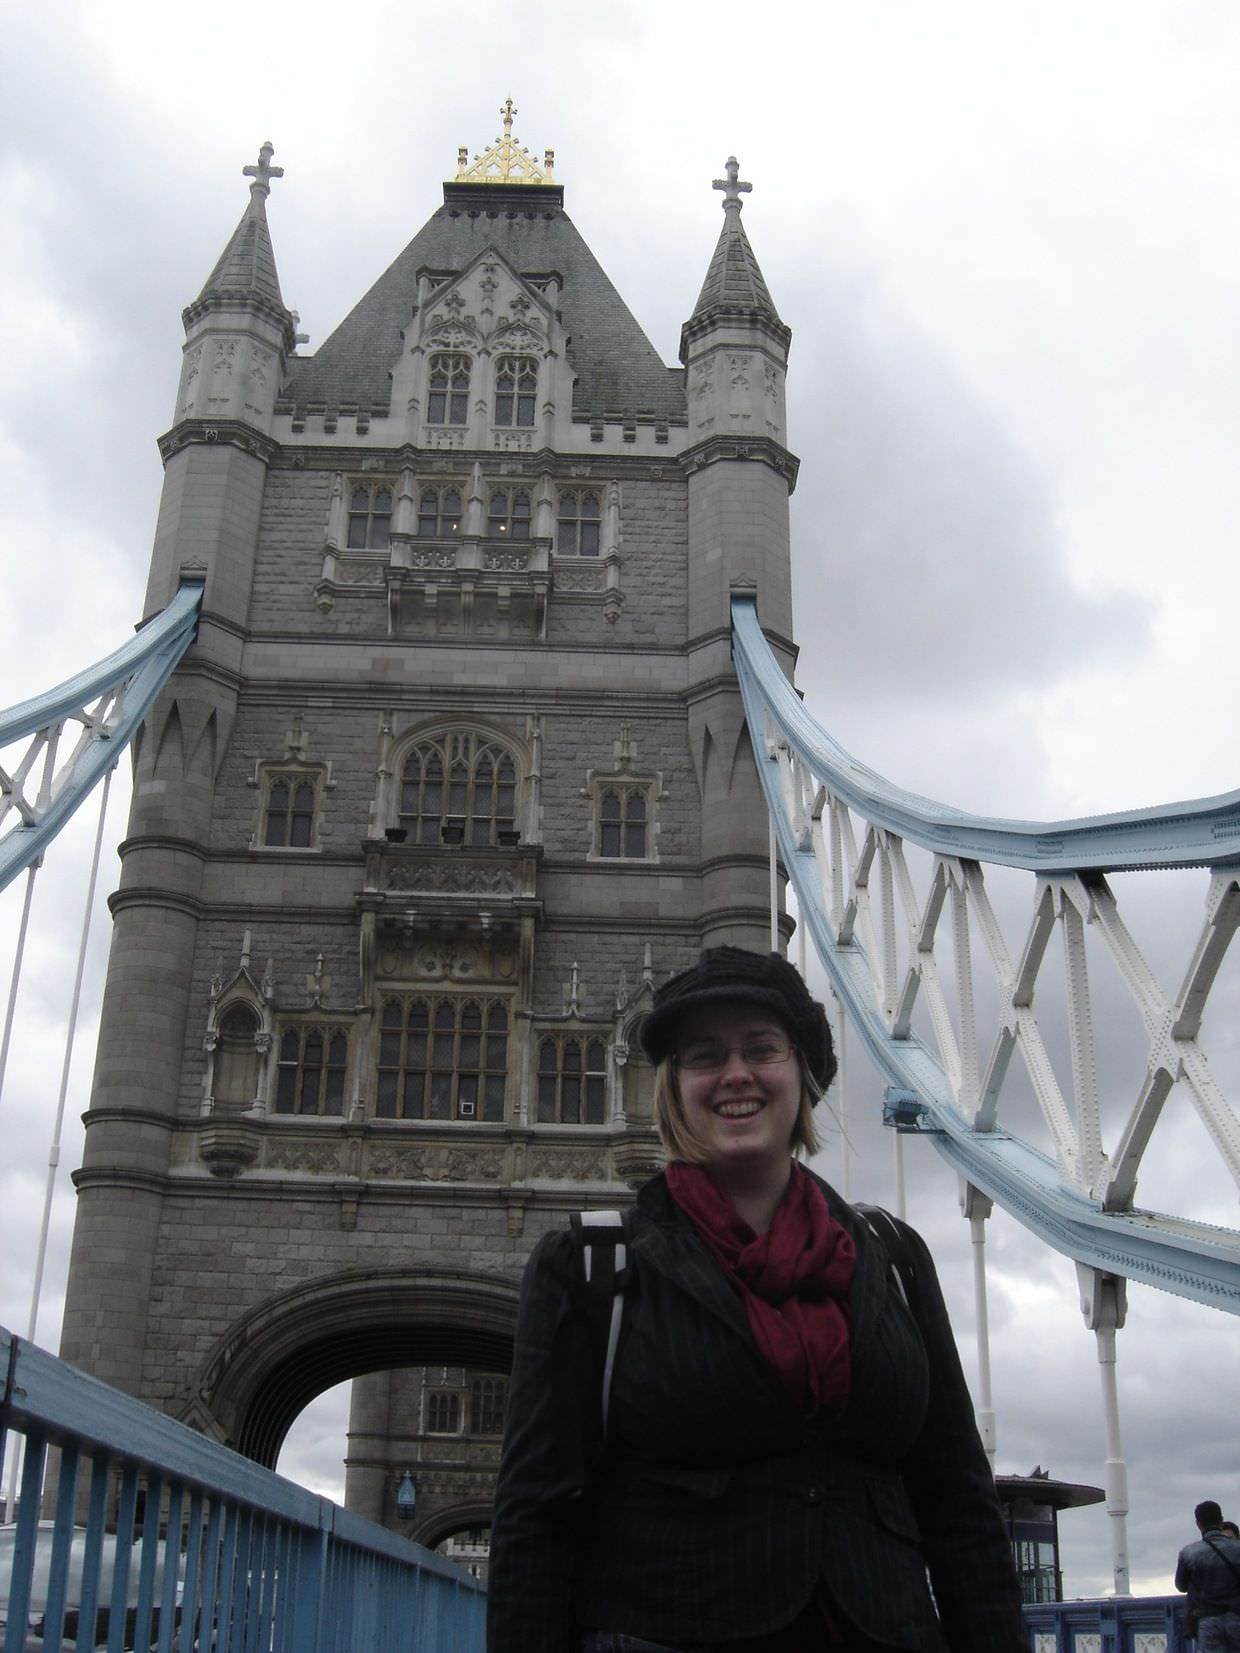 Samantha on London's tower bridge